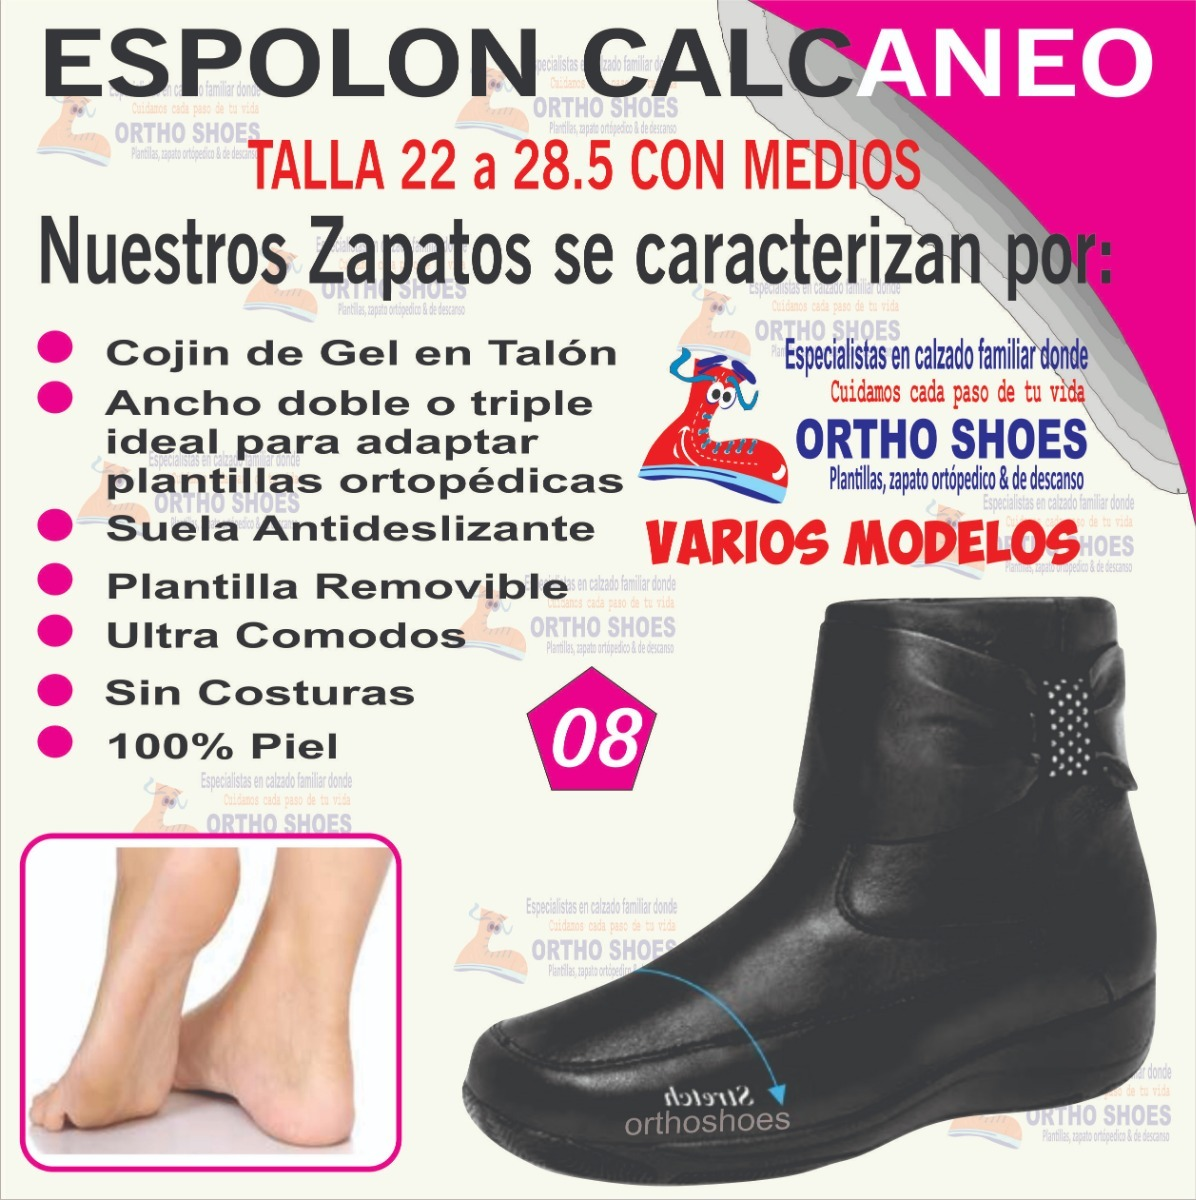 Zapato Zapato Calcaneo Mujer Espolon Espolon Mujer 1Tc3lFJK